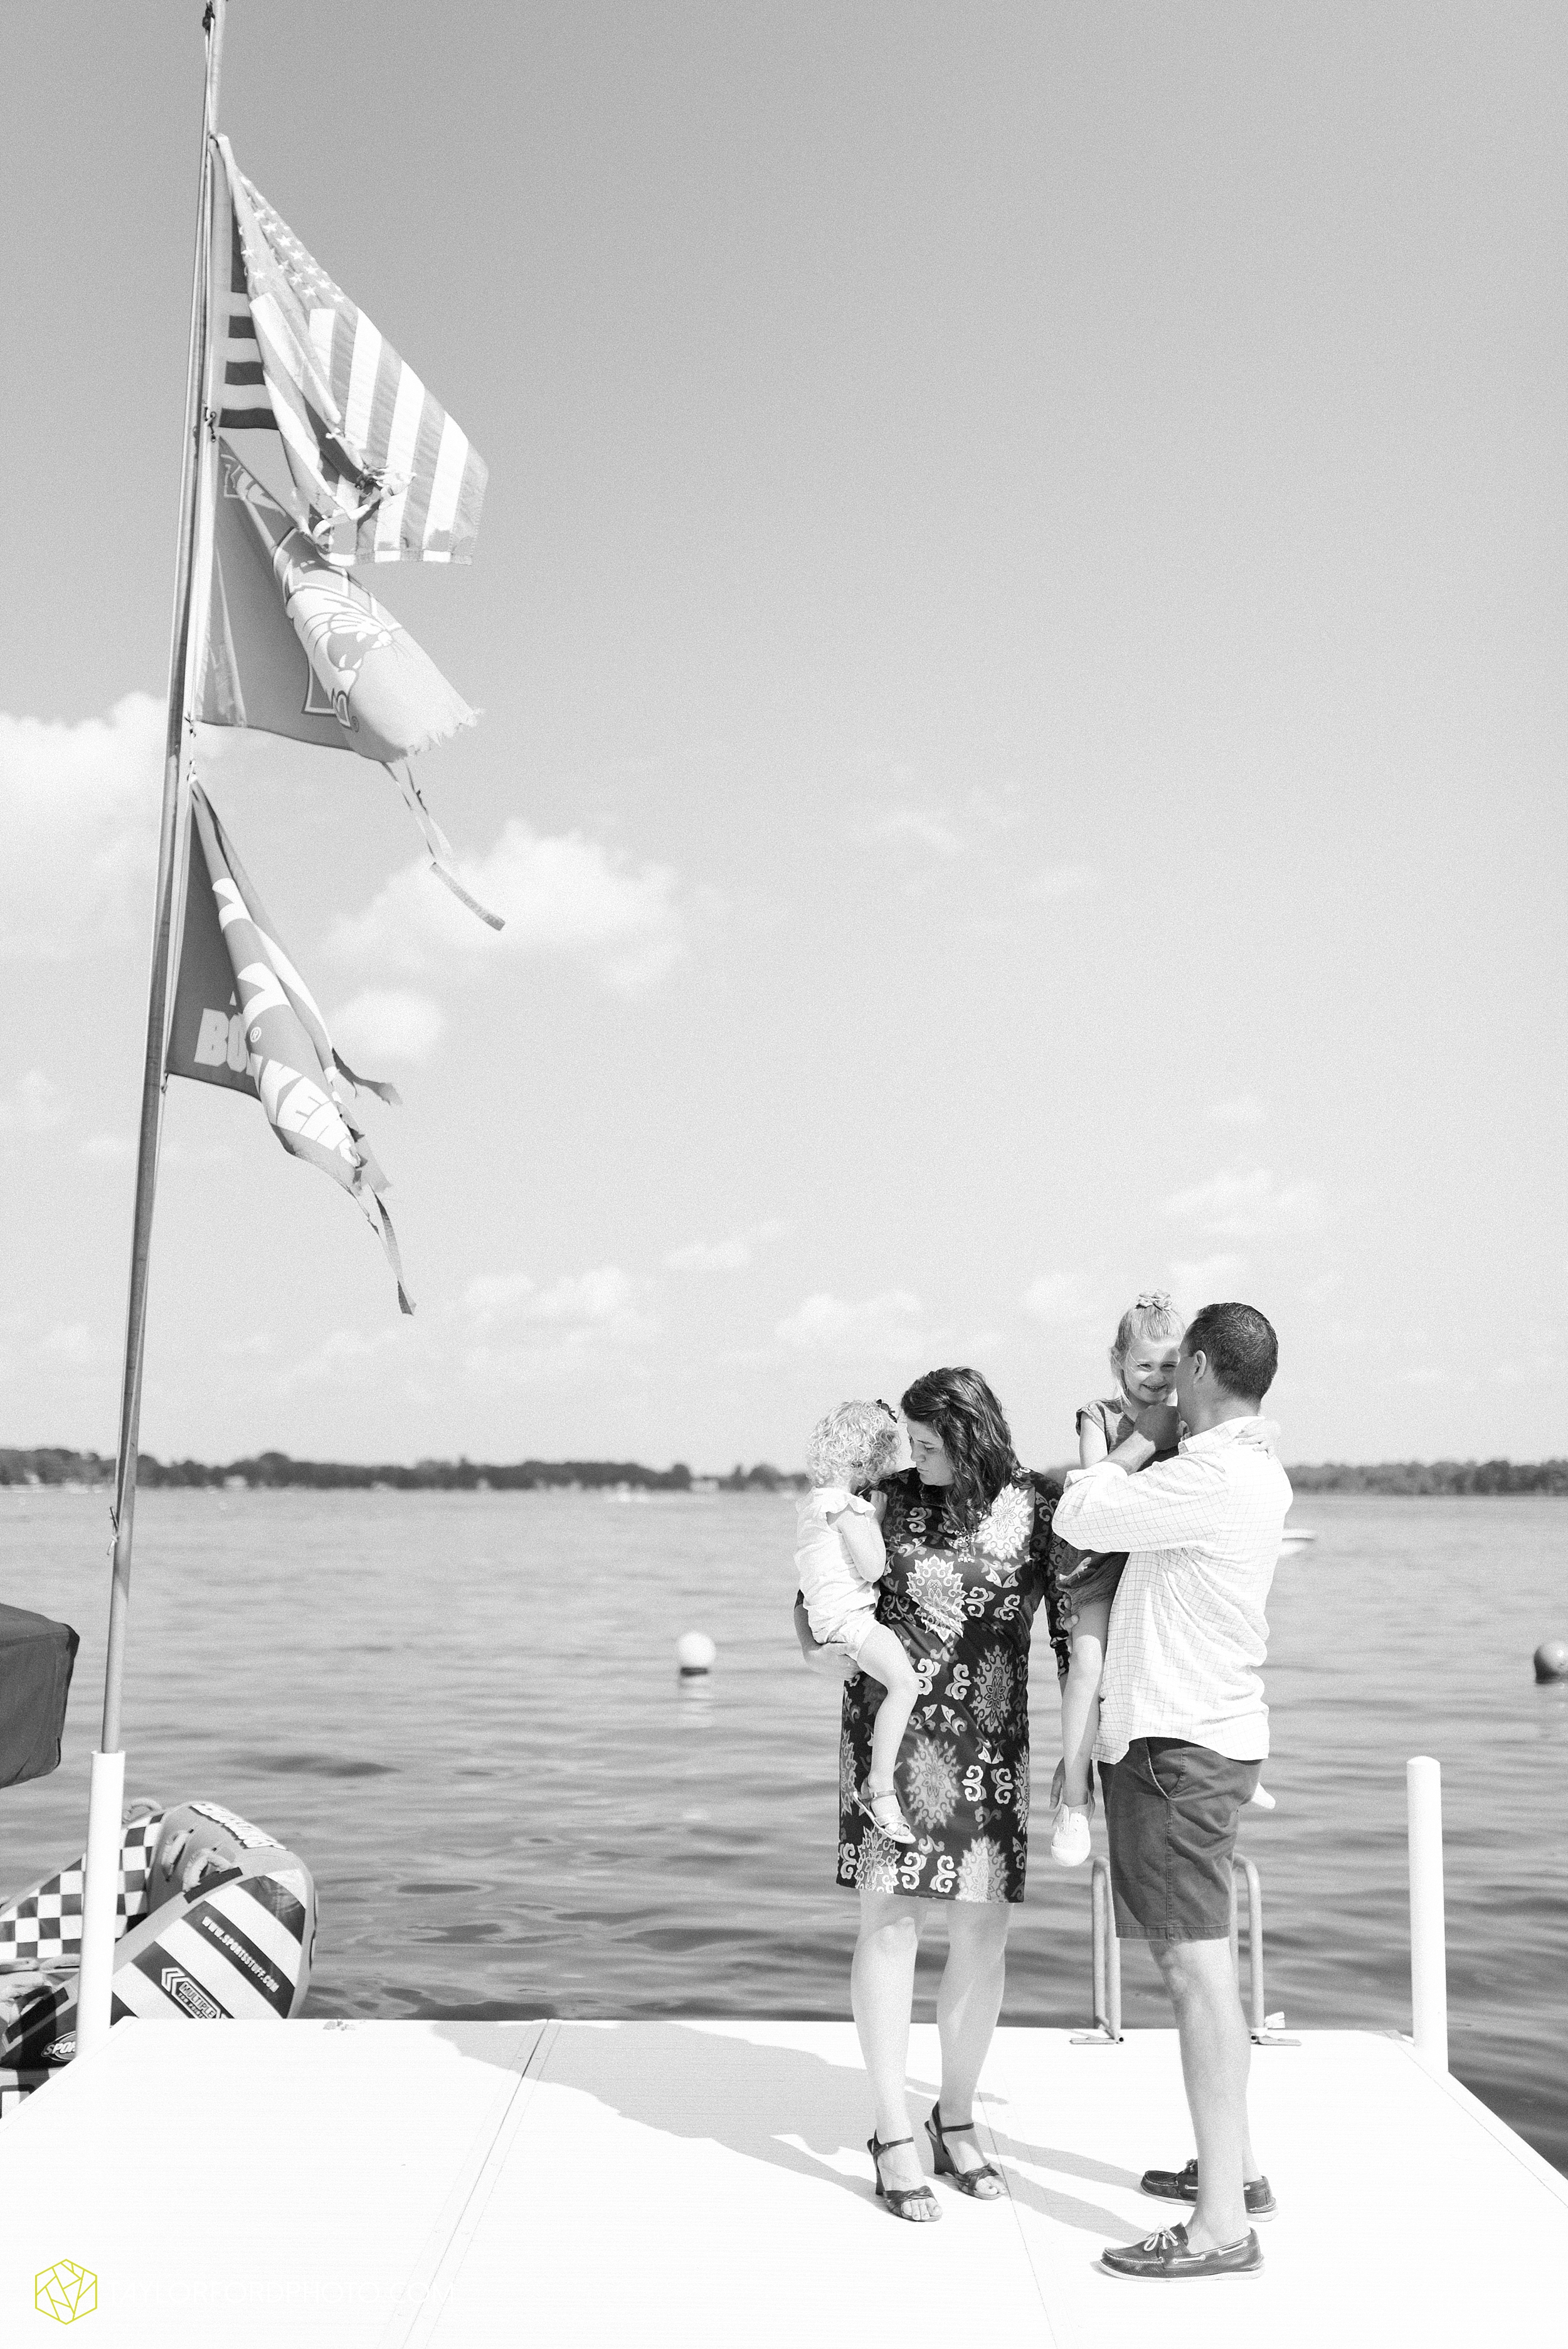 syracuse-indiana-lake-wawasee-family-lake-house-lakeside-park-lifestyle-photographer-taylor-ford-photographer_9433.jpg